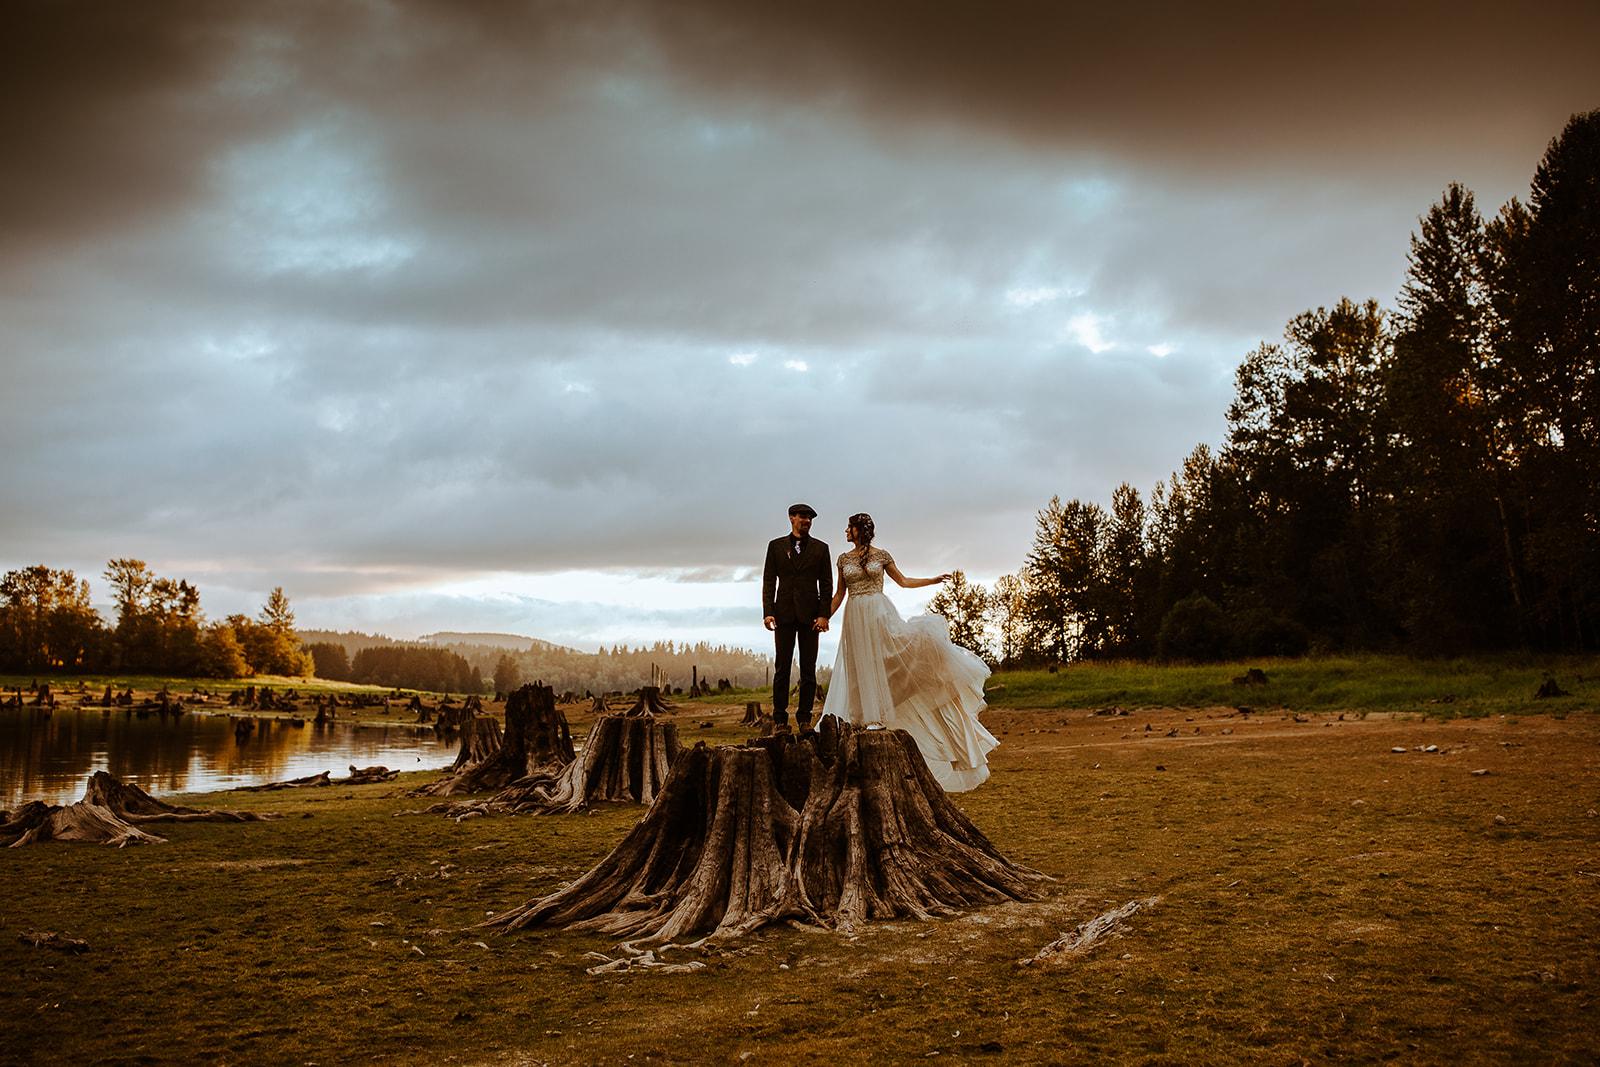 mount-rainier-cabin-elopement-megan-gallagher-photography_(478_of_568).jpg